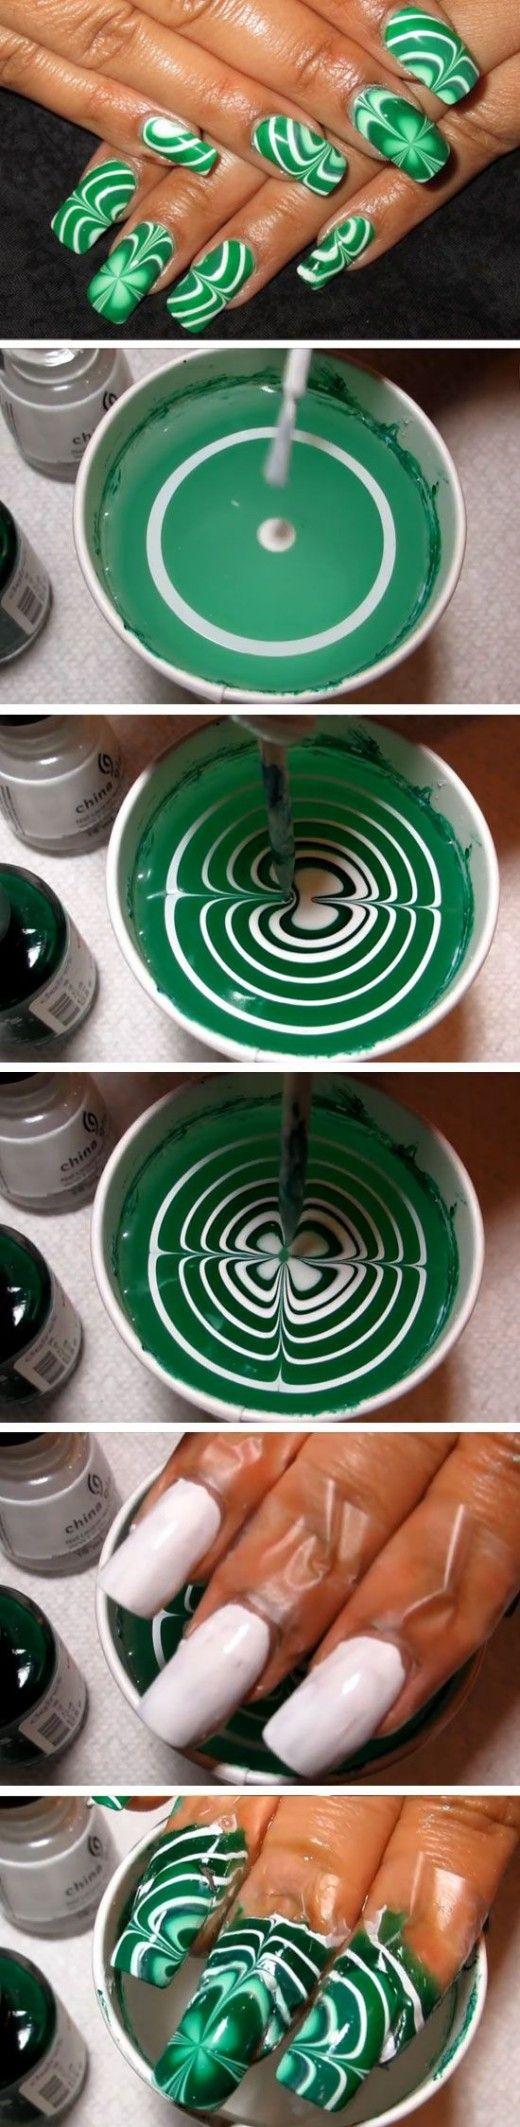 Water Marble Shamrocks | Easy St Patricks Day Nail Designs